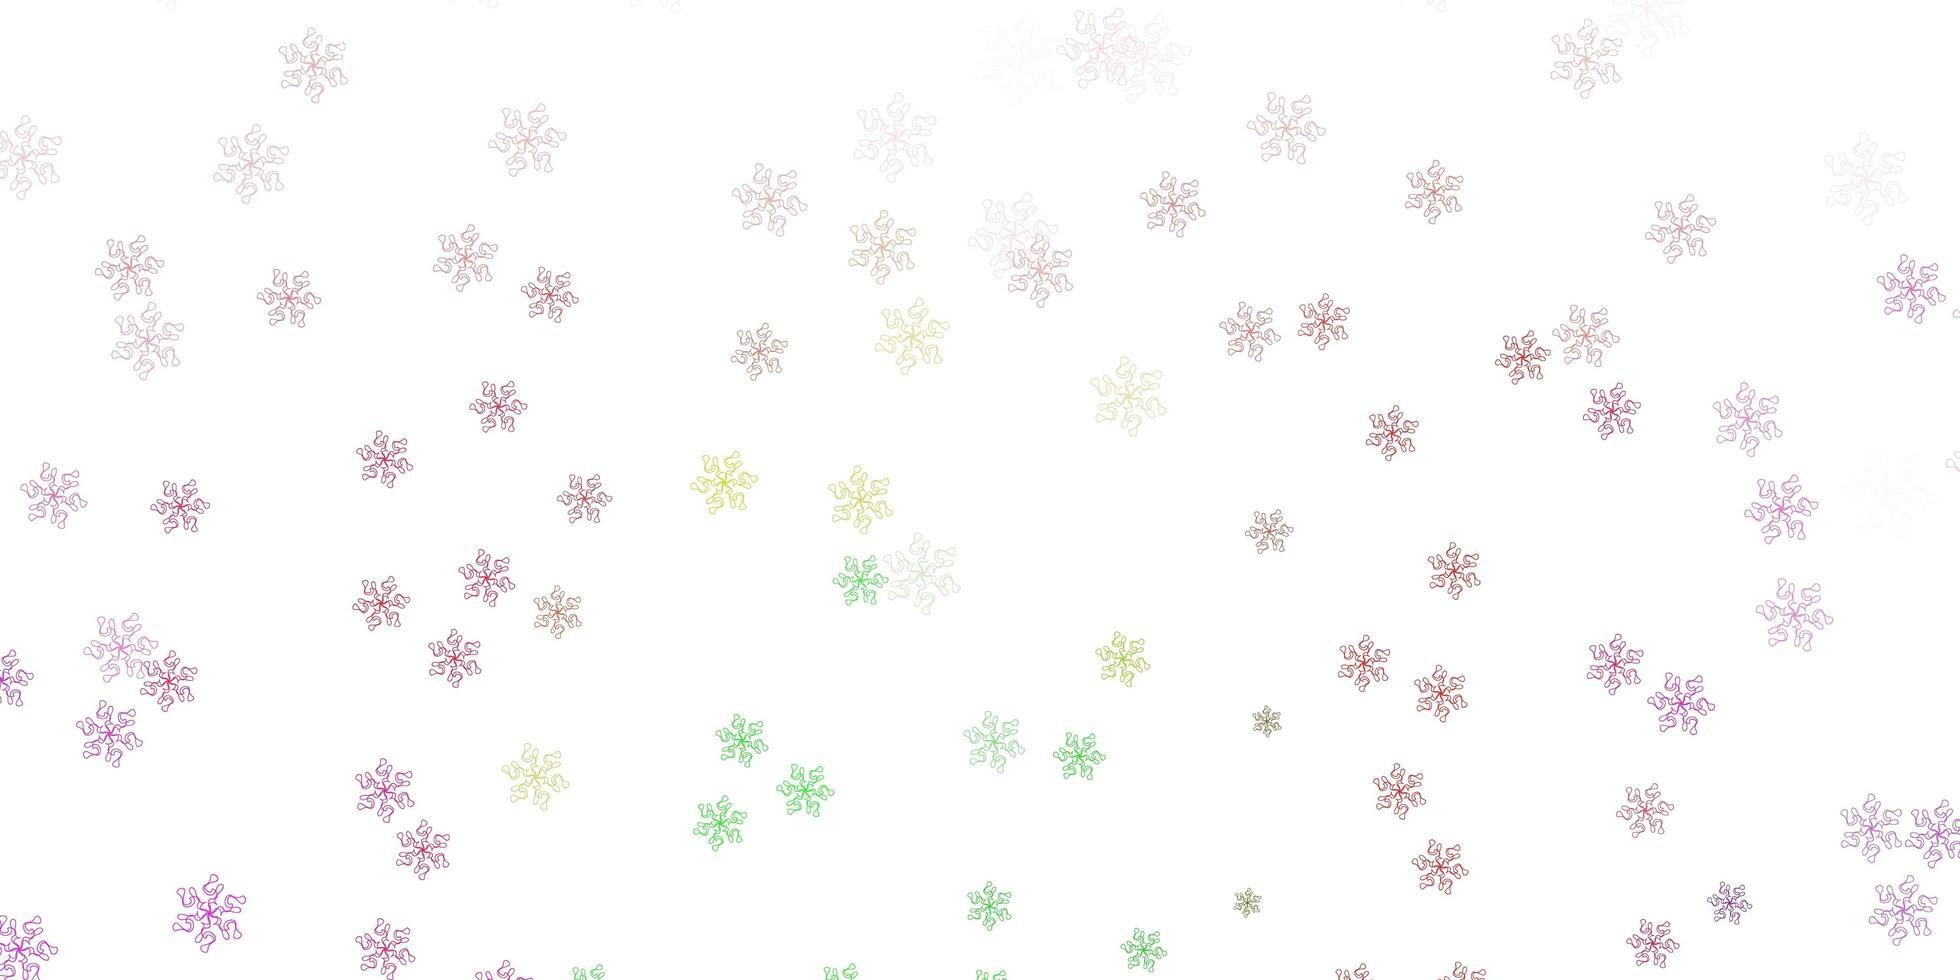 luz rosa, verde vetor doodle textura com flores.